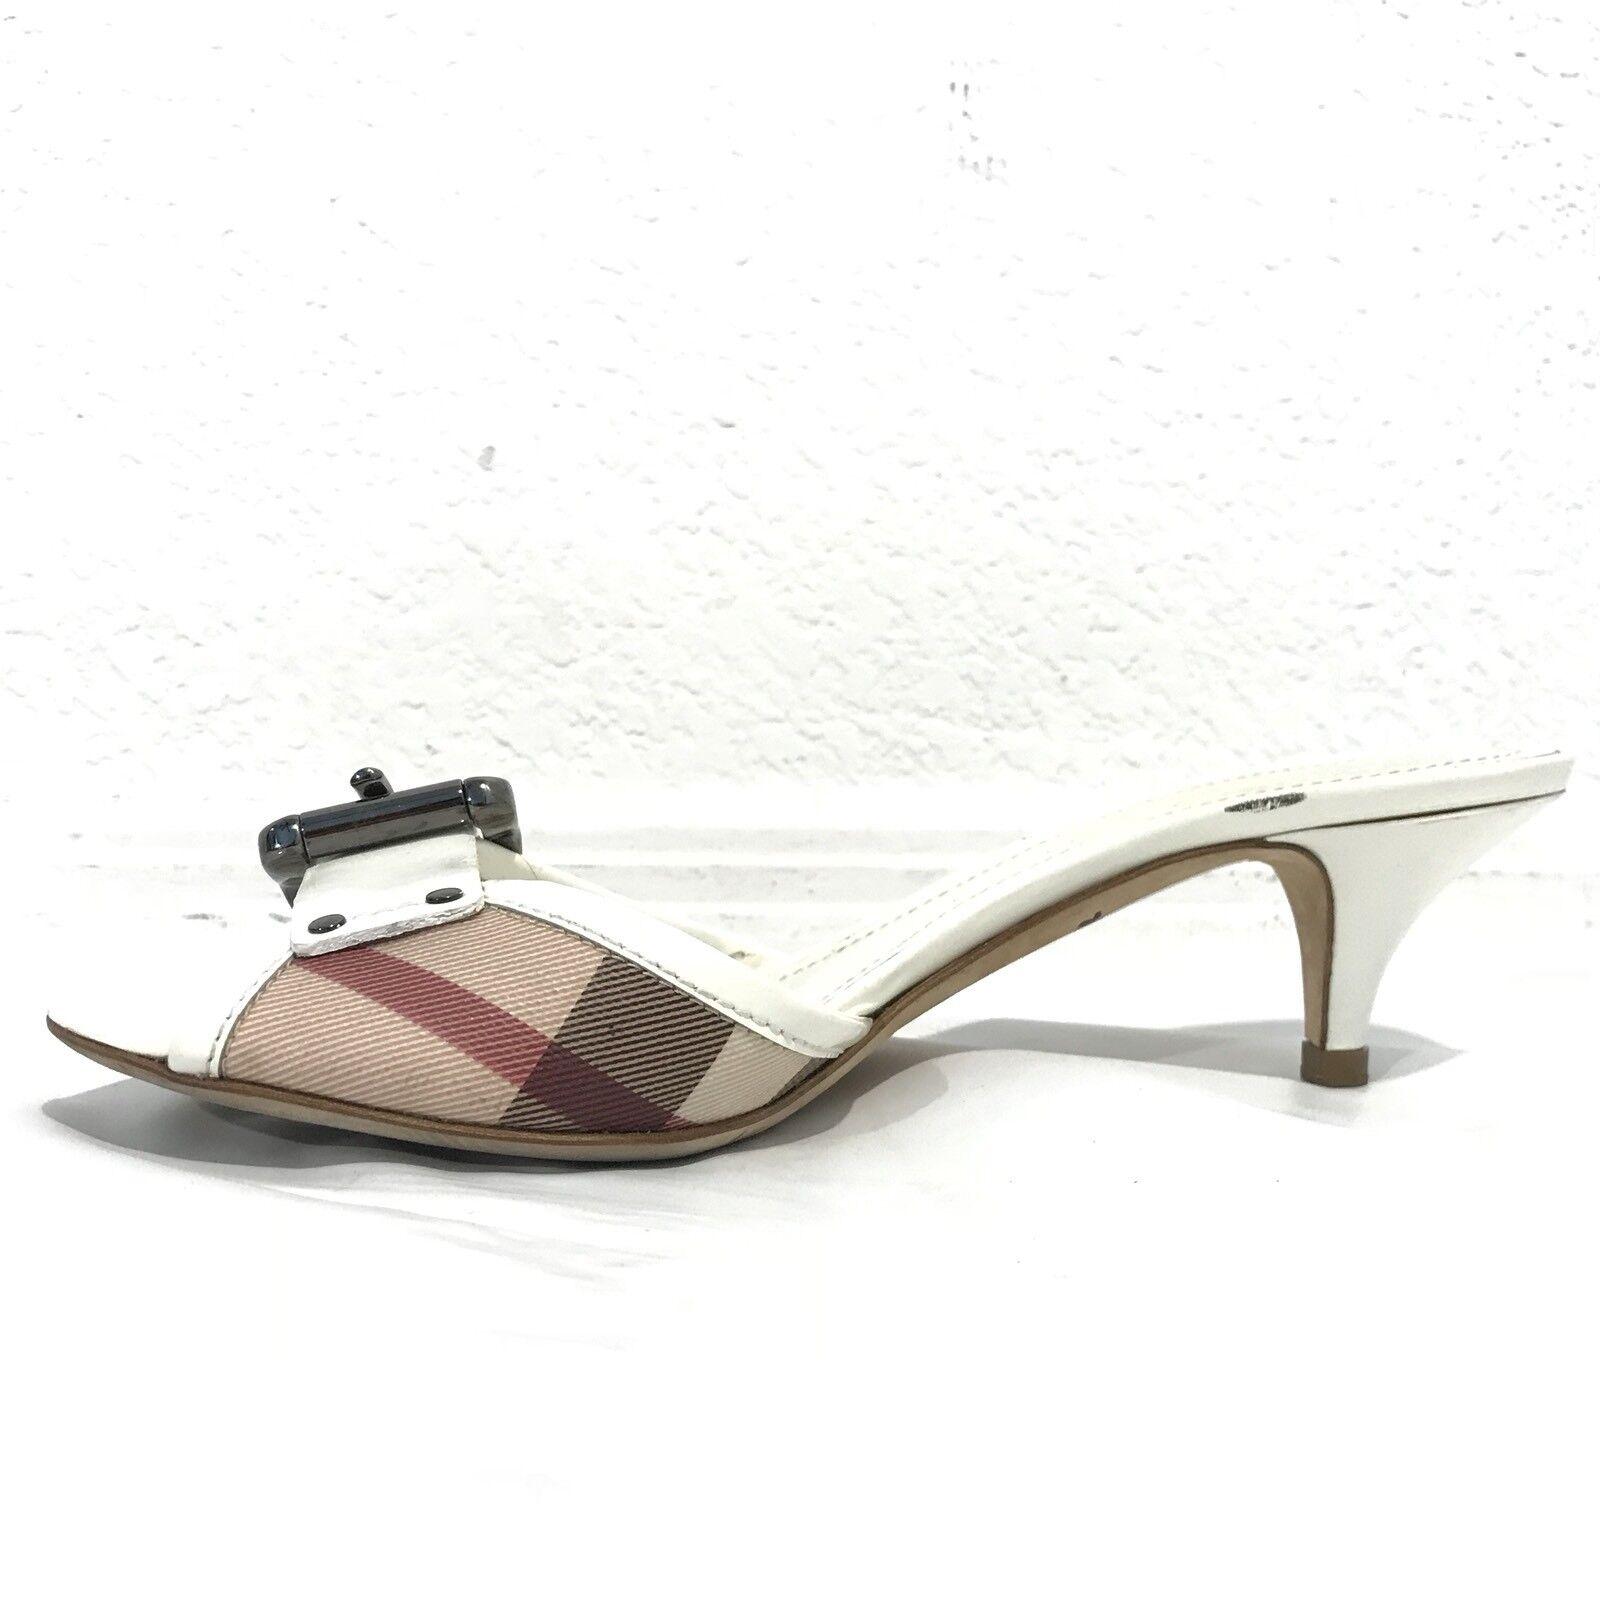 BURBERRY Nova Check Weiß 5.5 Kitten Heel Sandales Slides 5.5 Weiß 35.5 Plaid d9ed6f